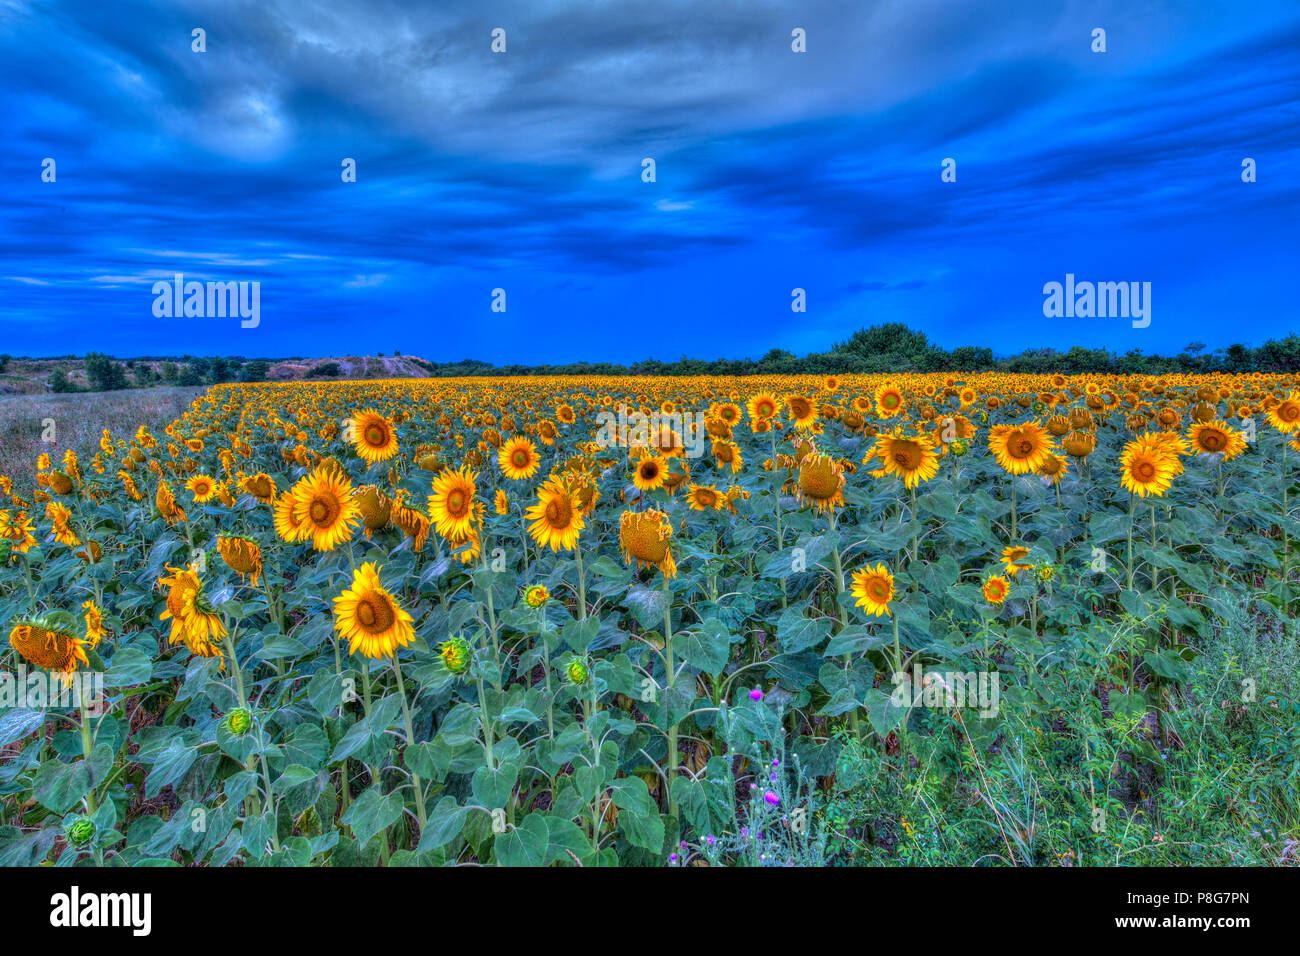 Sunflower field - Stock Image